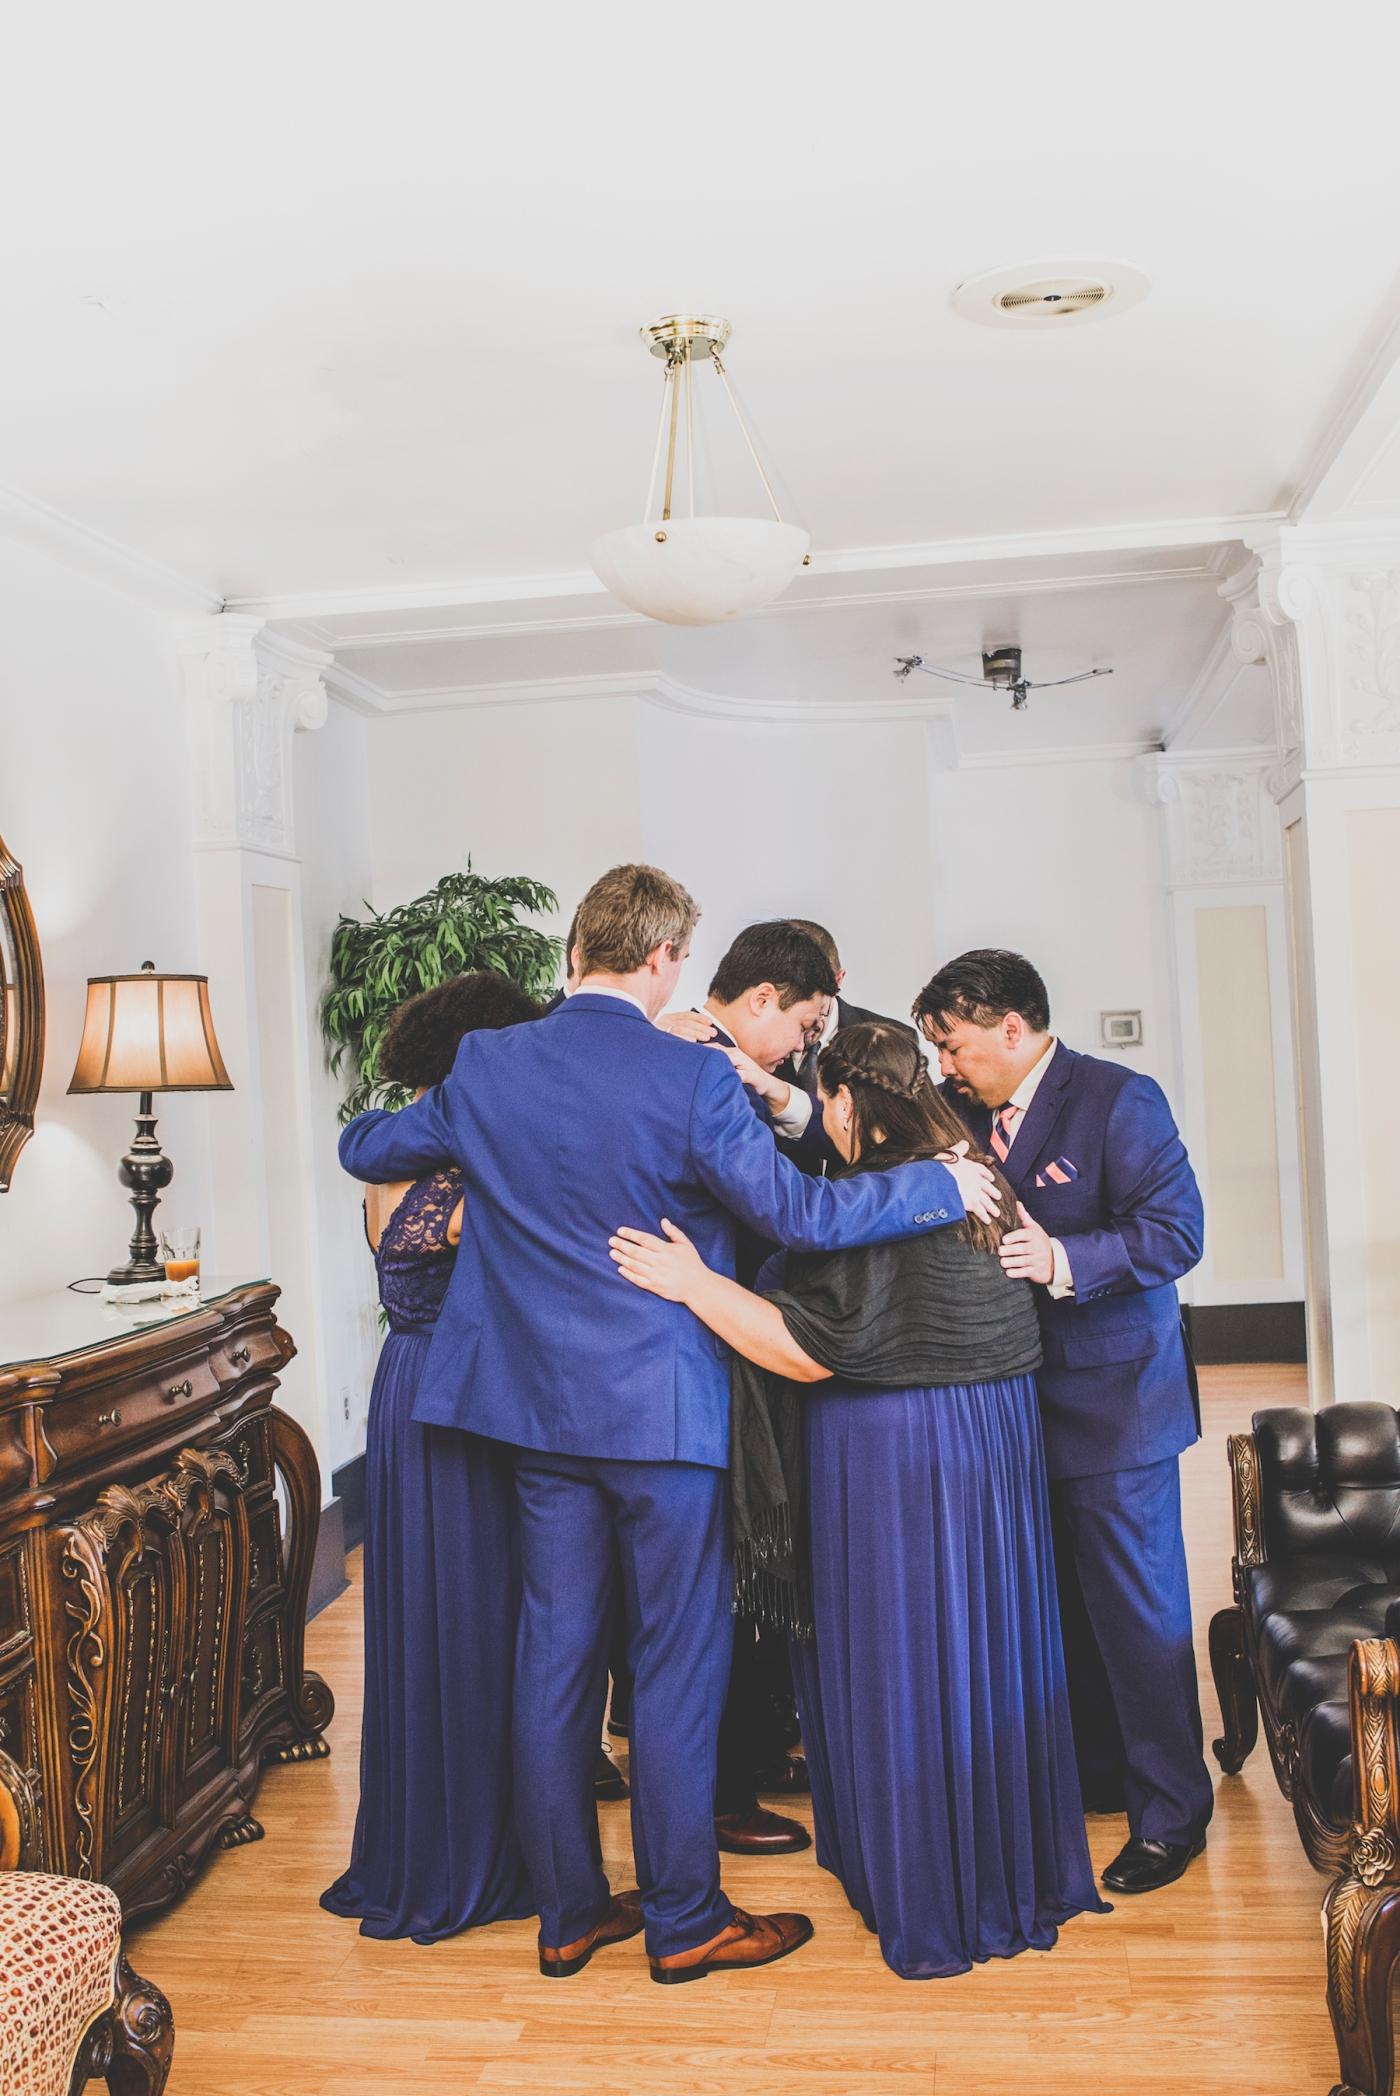 DSC_2385Everett_Wedding_Ballroom_Jane_Speleers_photography_Rachel_and_Edmund_Praying_2017